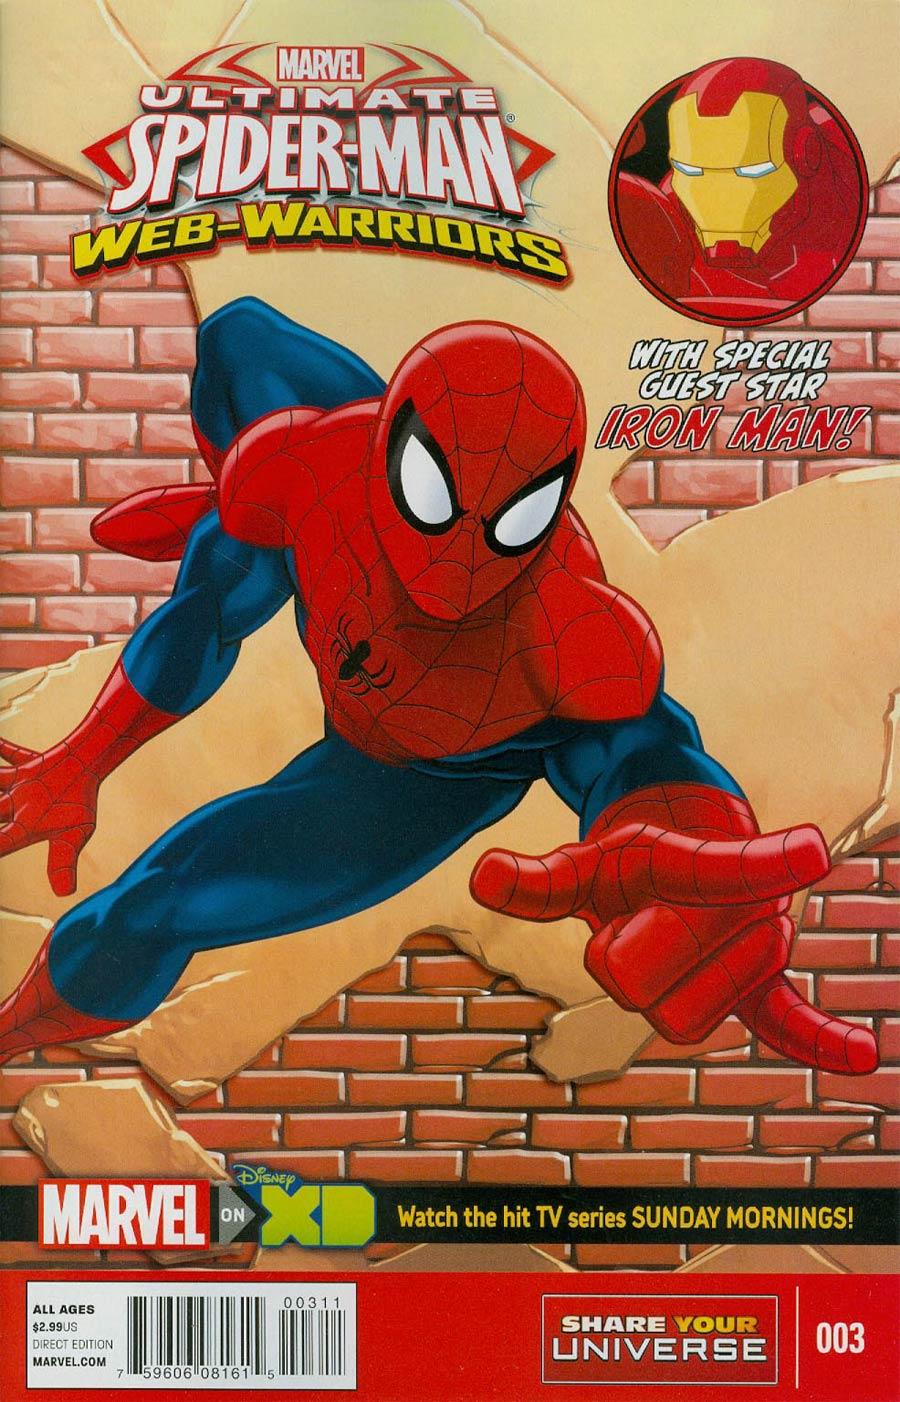 Marvel Universe Ultimate Spider-Man Web Warriors #3